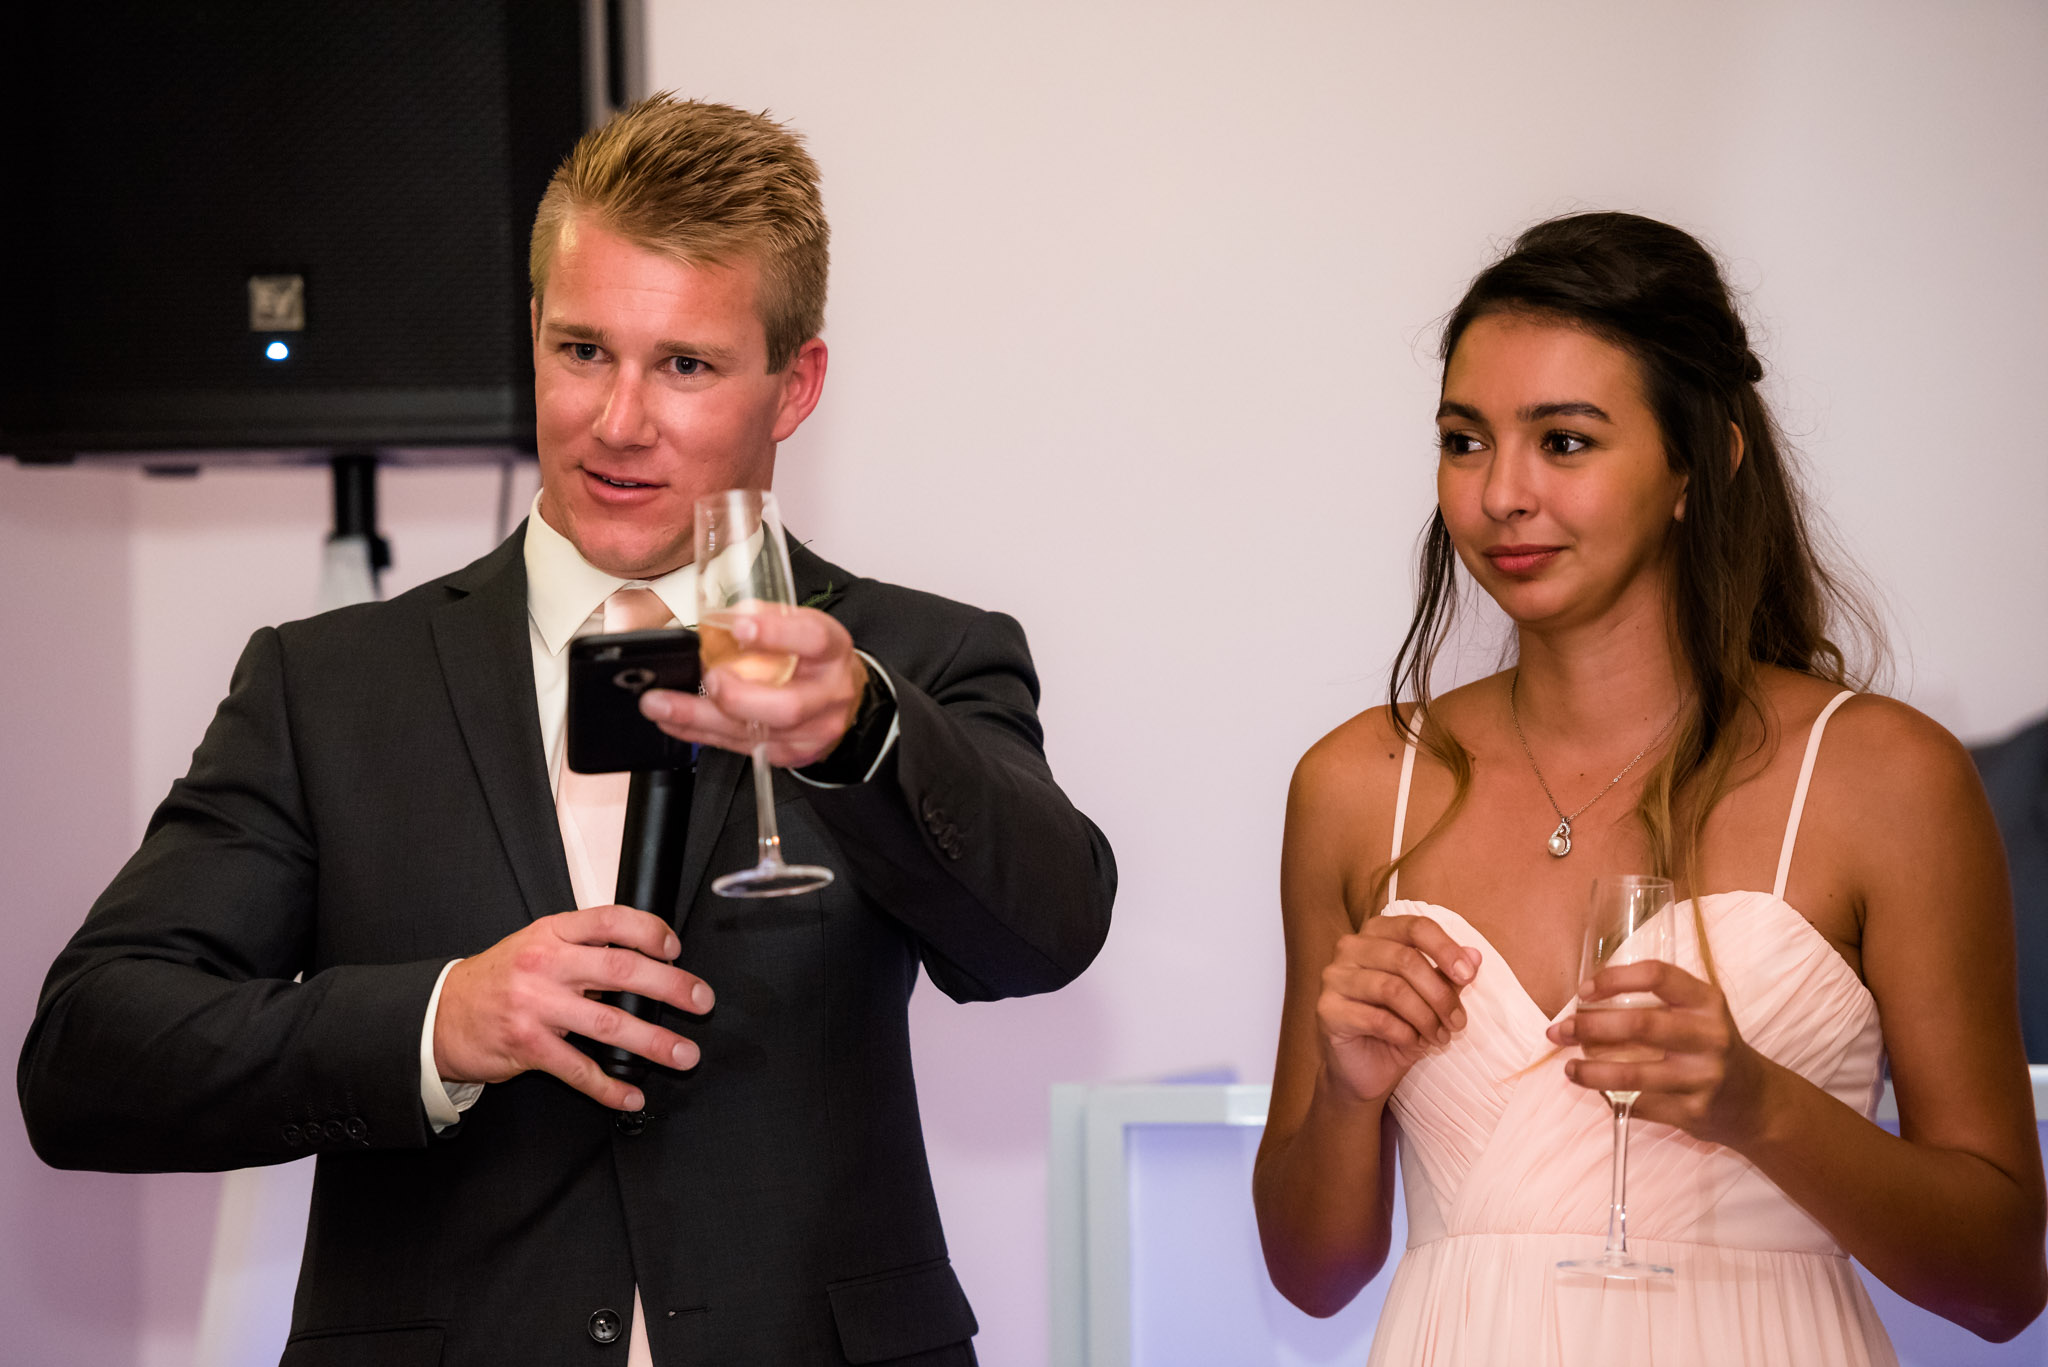 Avensole-Winery-Temecula-Wedding-Josh-and-Olivia-3983.JPG